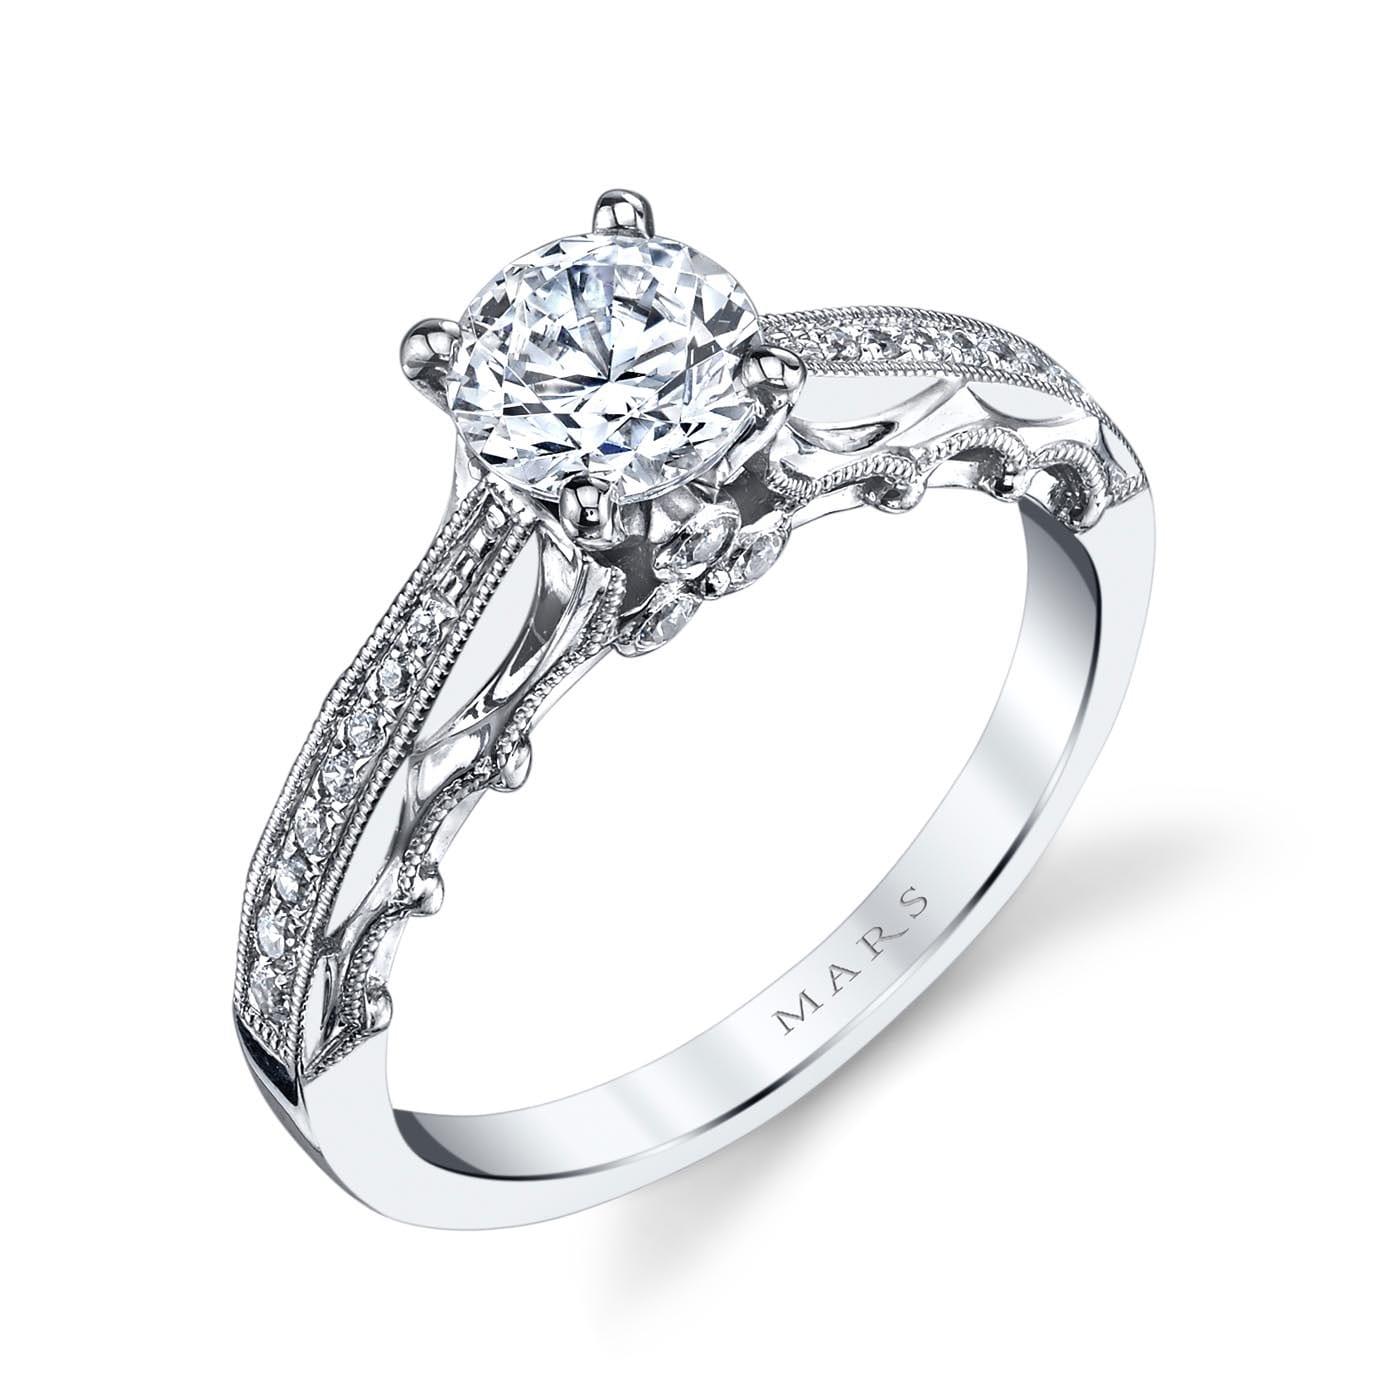 Vintage Engagement RingStyle #: MARS 25866